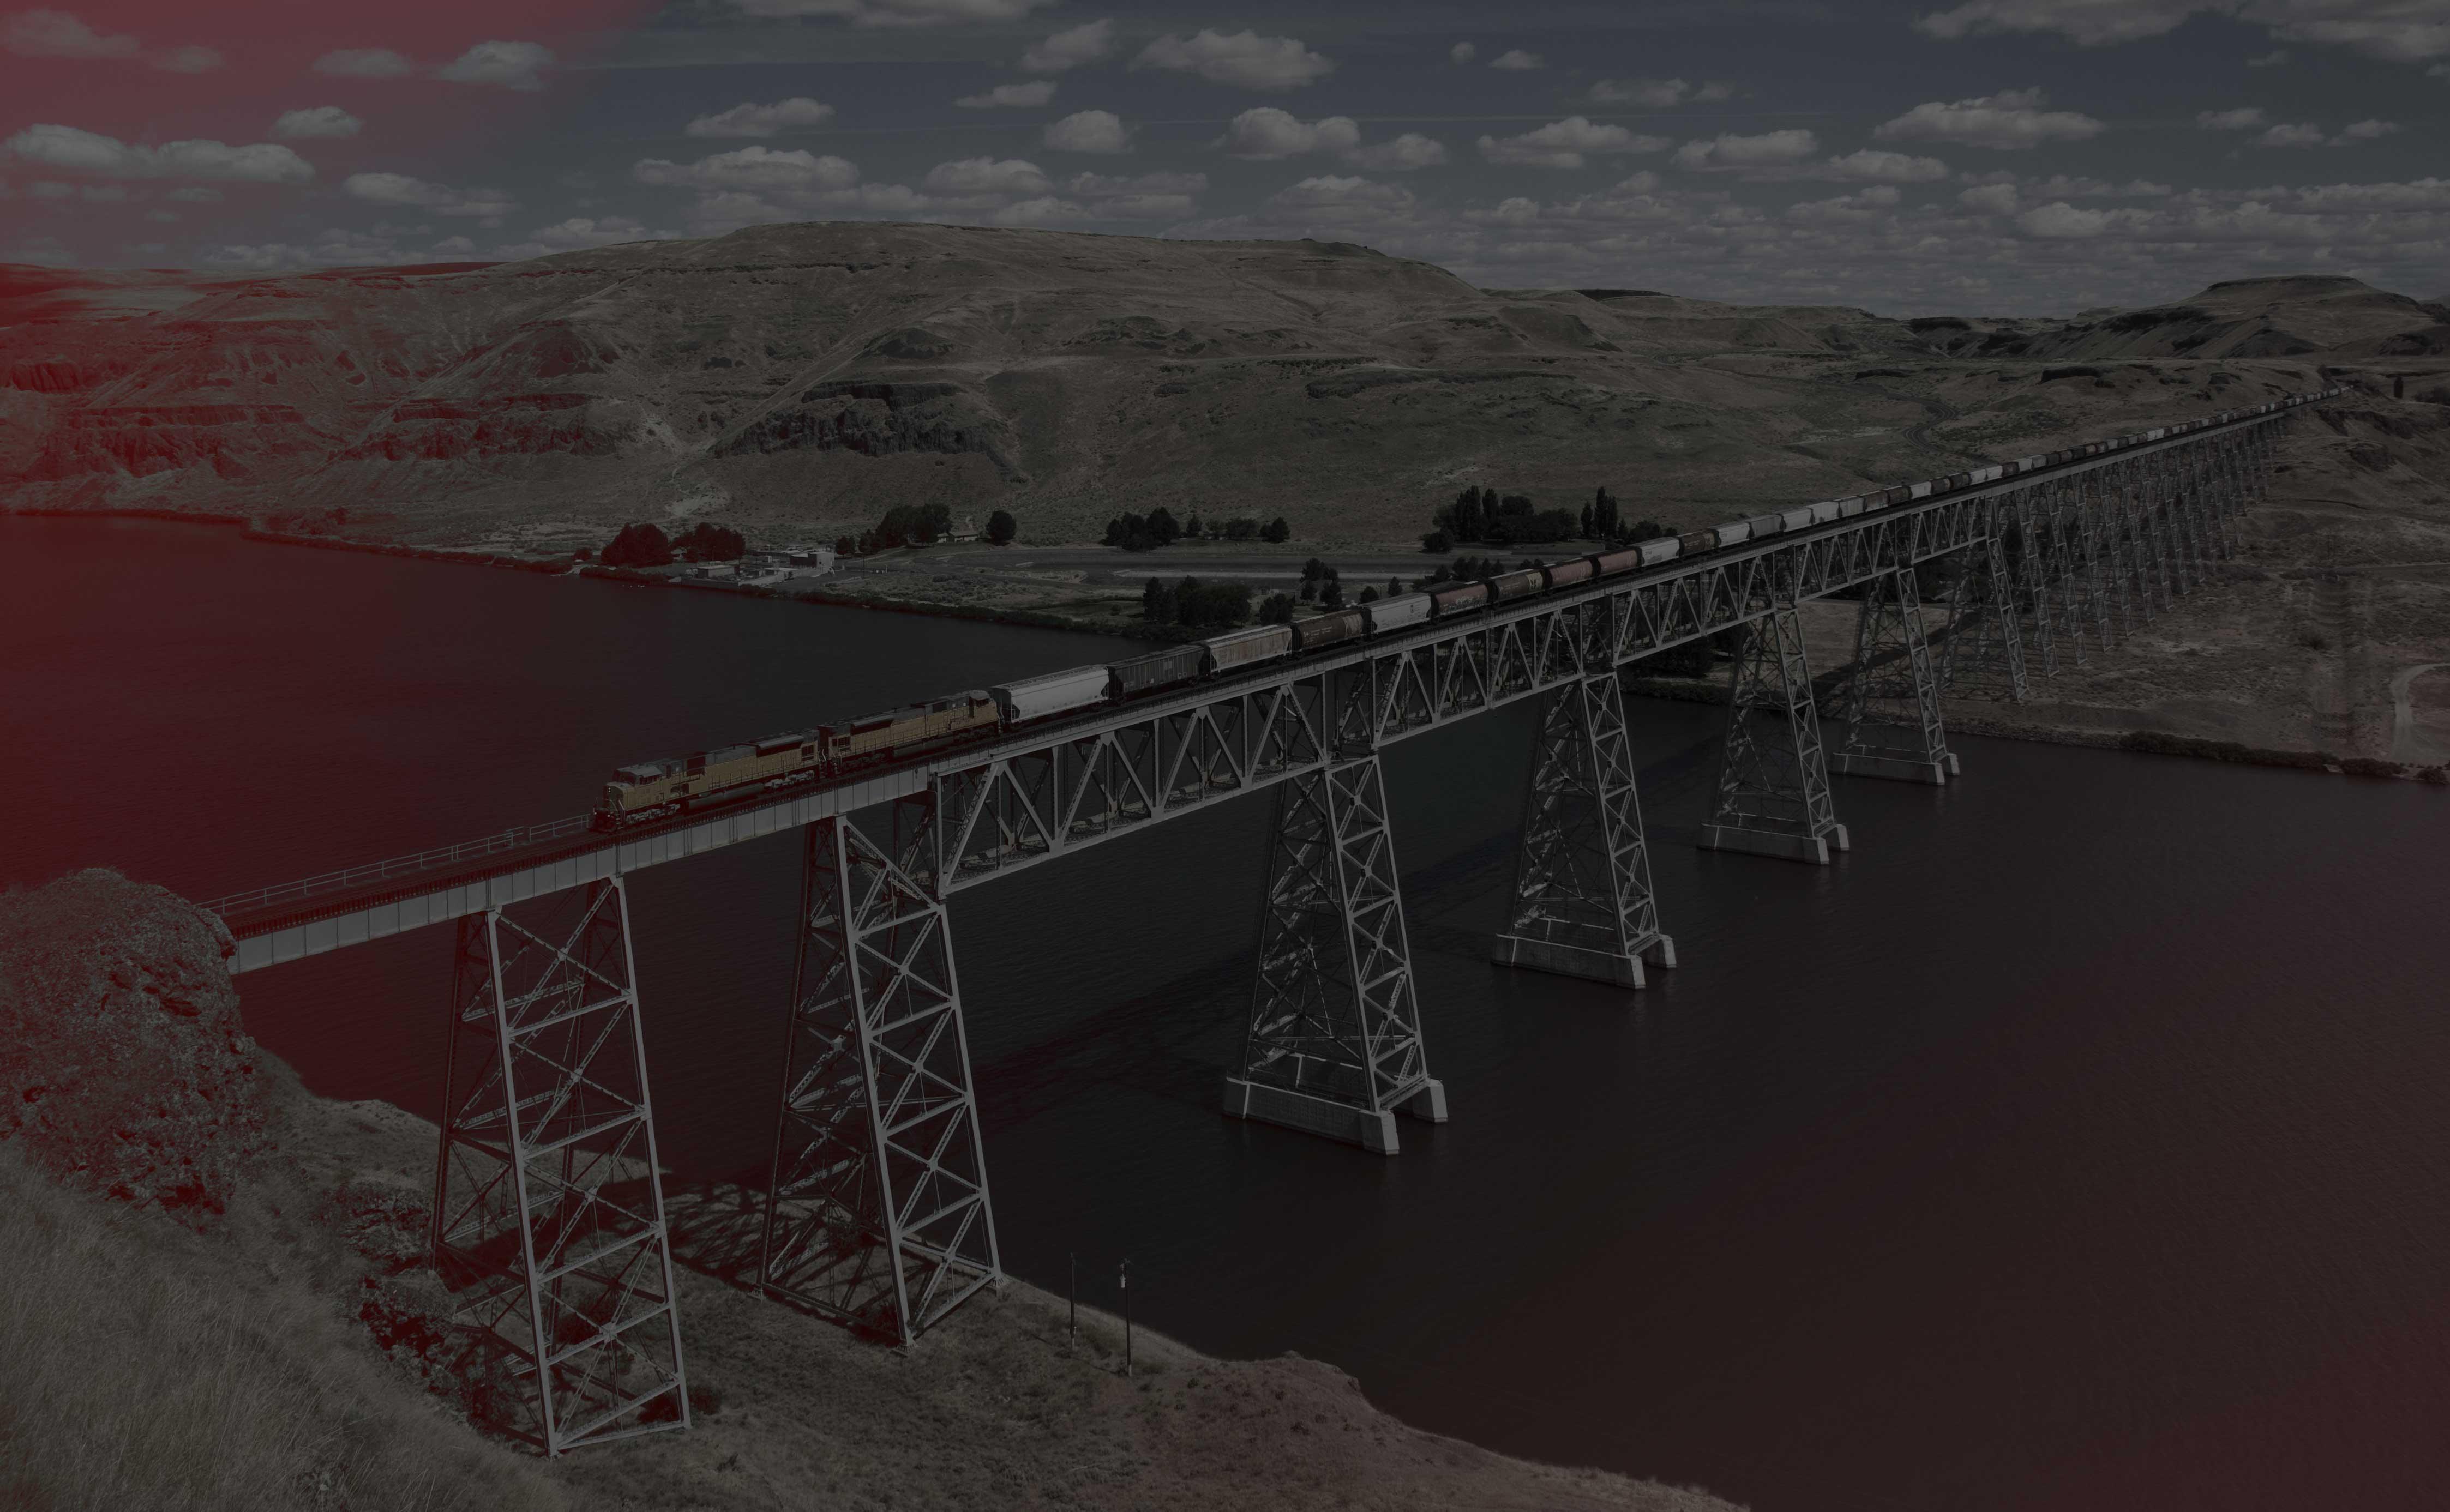 Centrail Railway Manufaturing bridges your needs for railway services